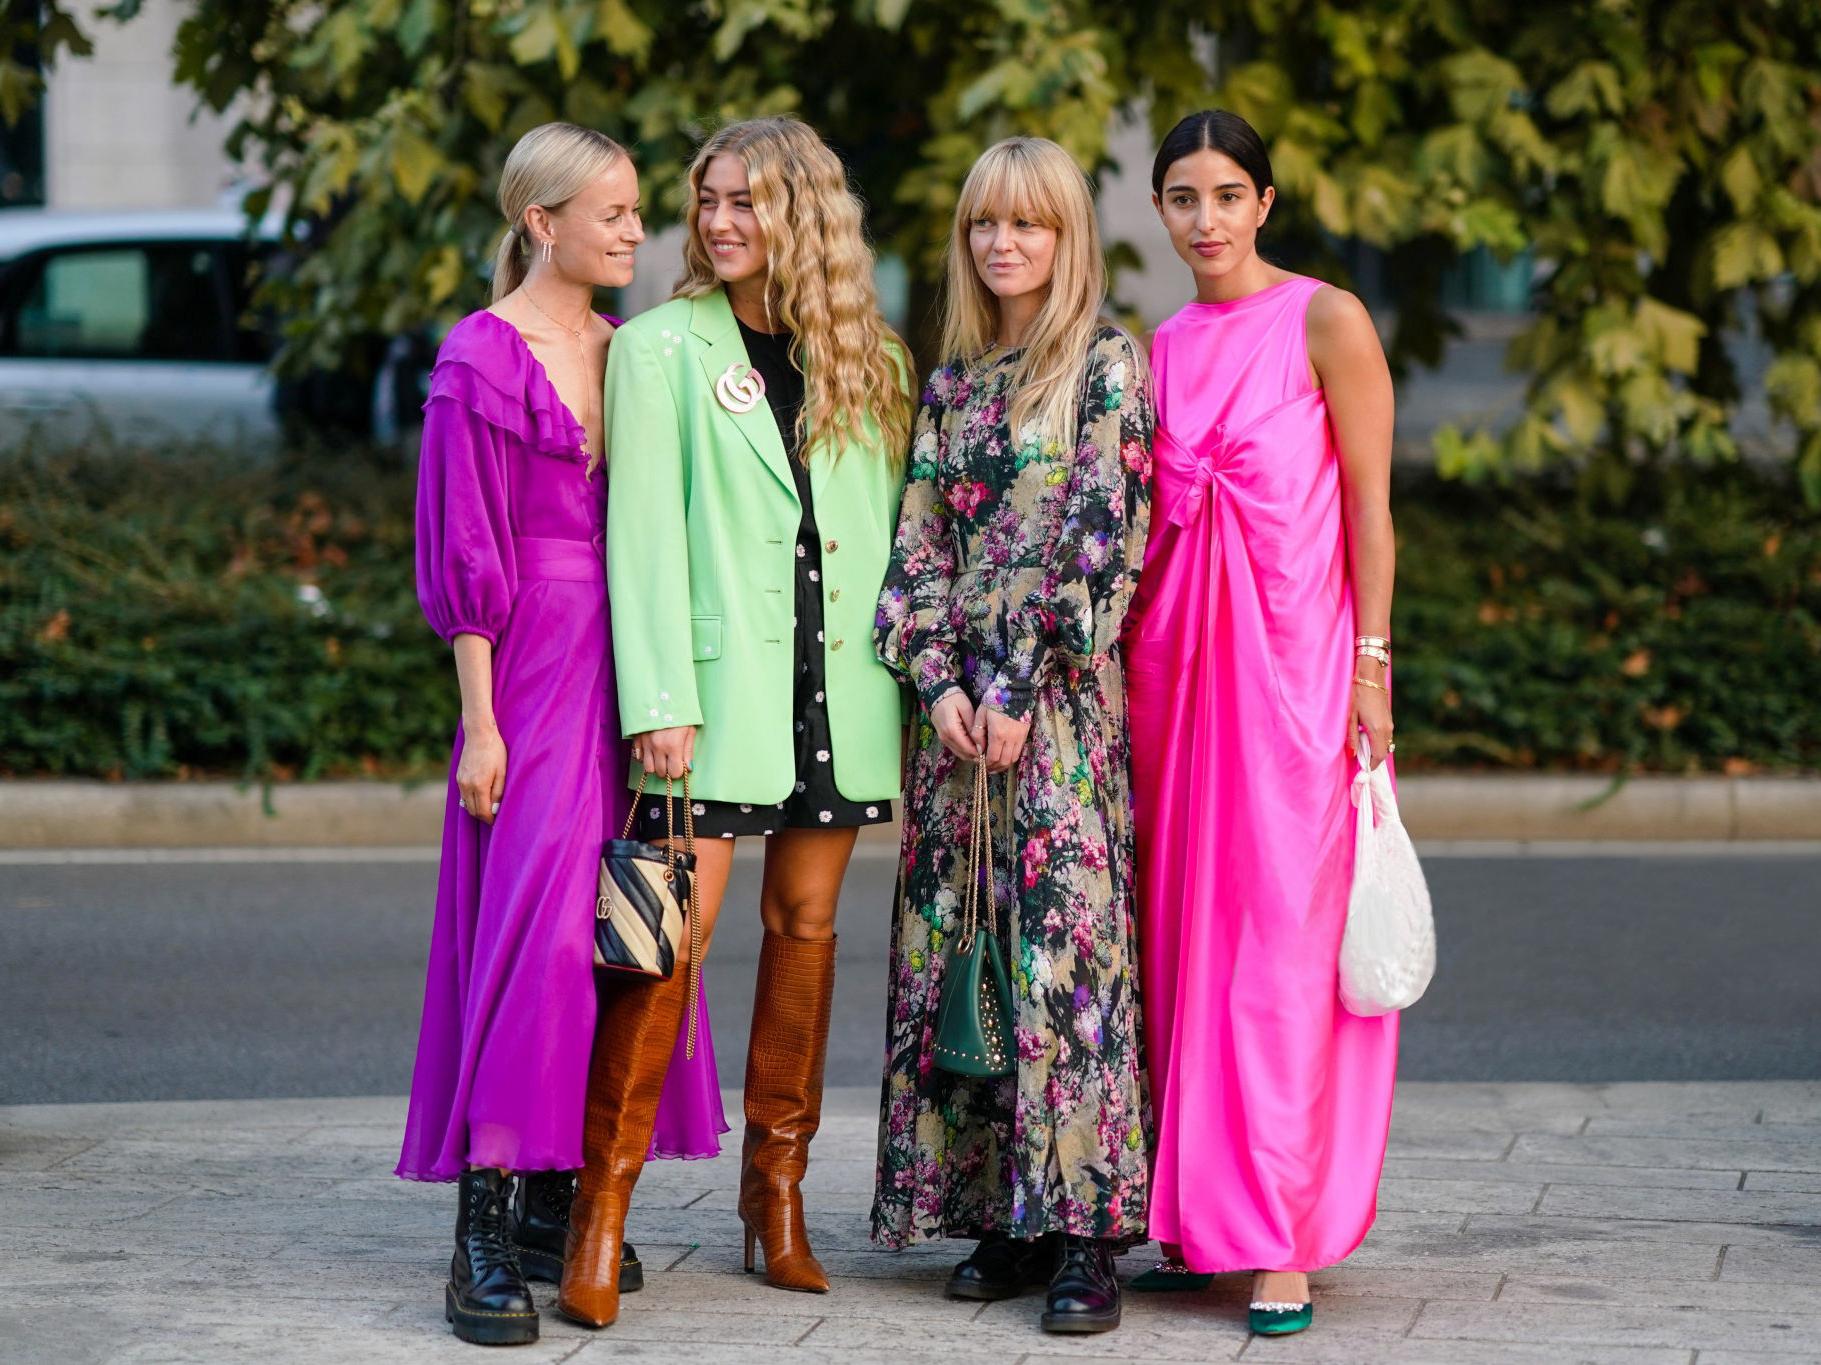 Thora Valdimars, Emili Sindlev, Jeanette Madsen et Bettina Looney @ Milan FW Printemps-Eté 2020.jpg